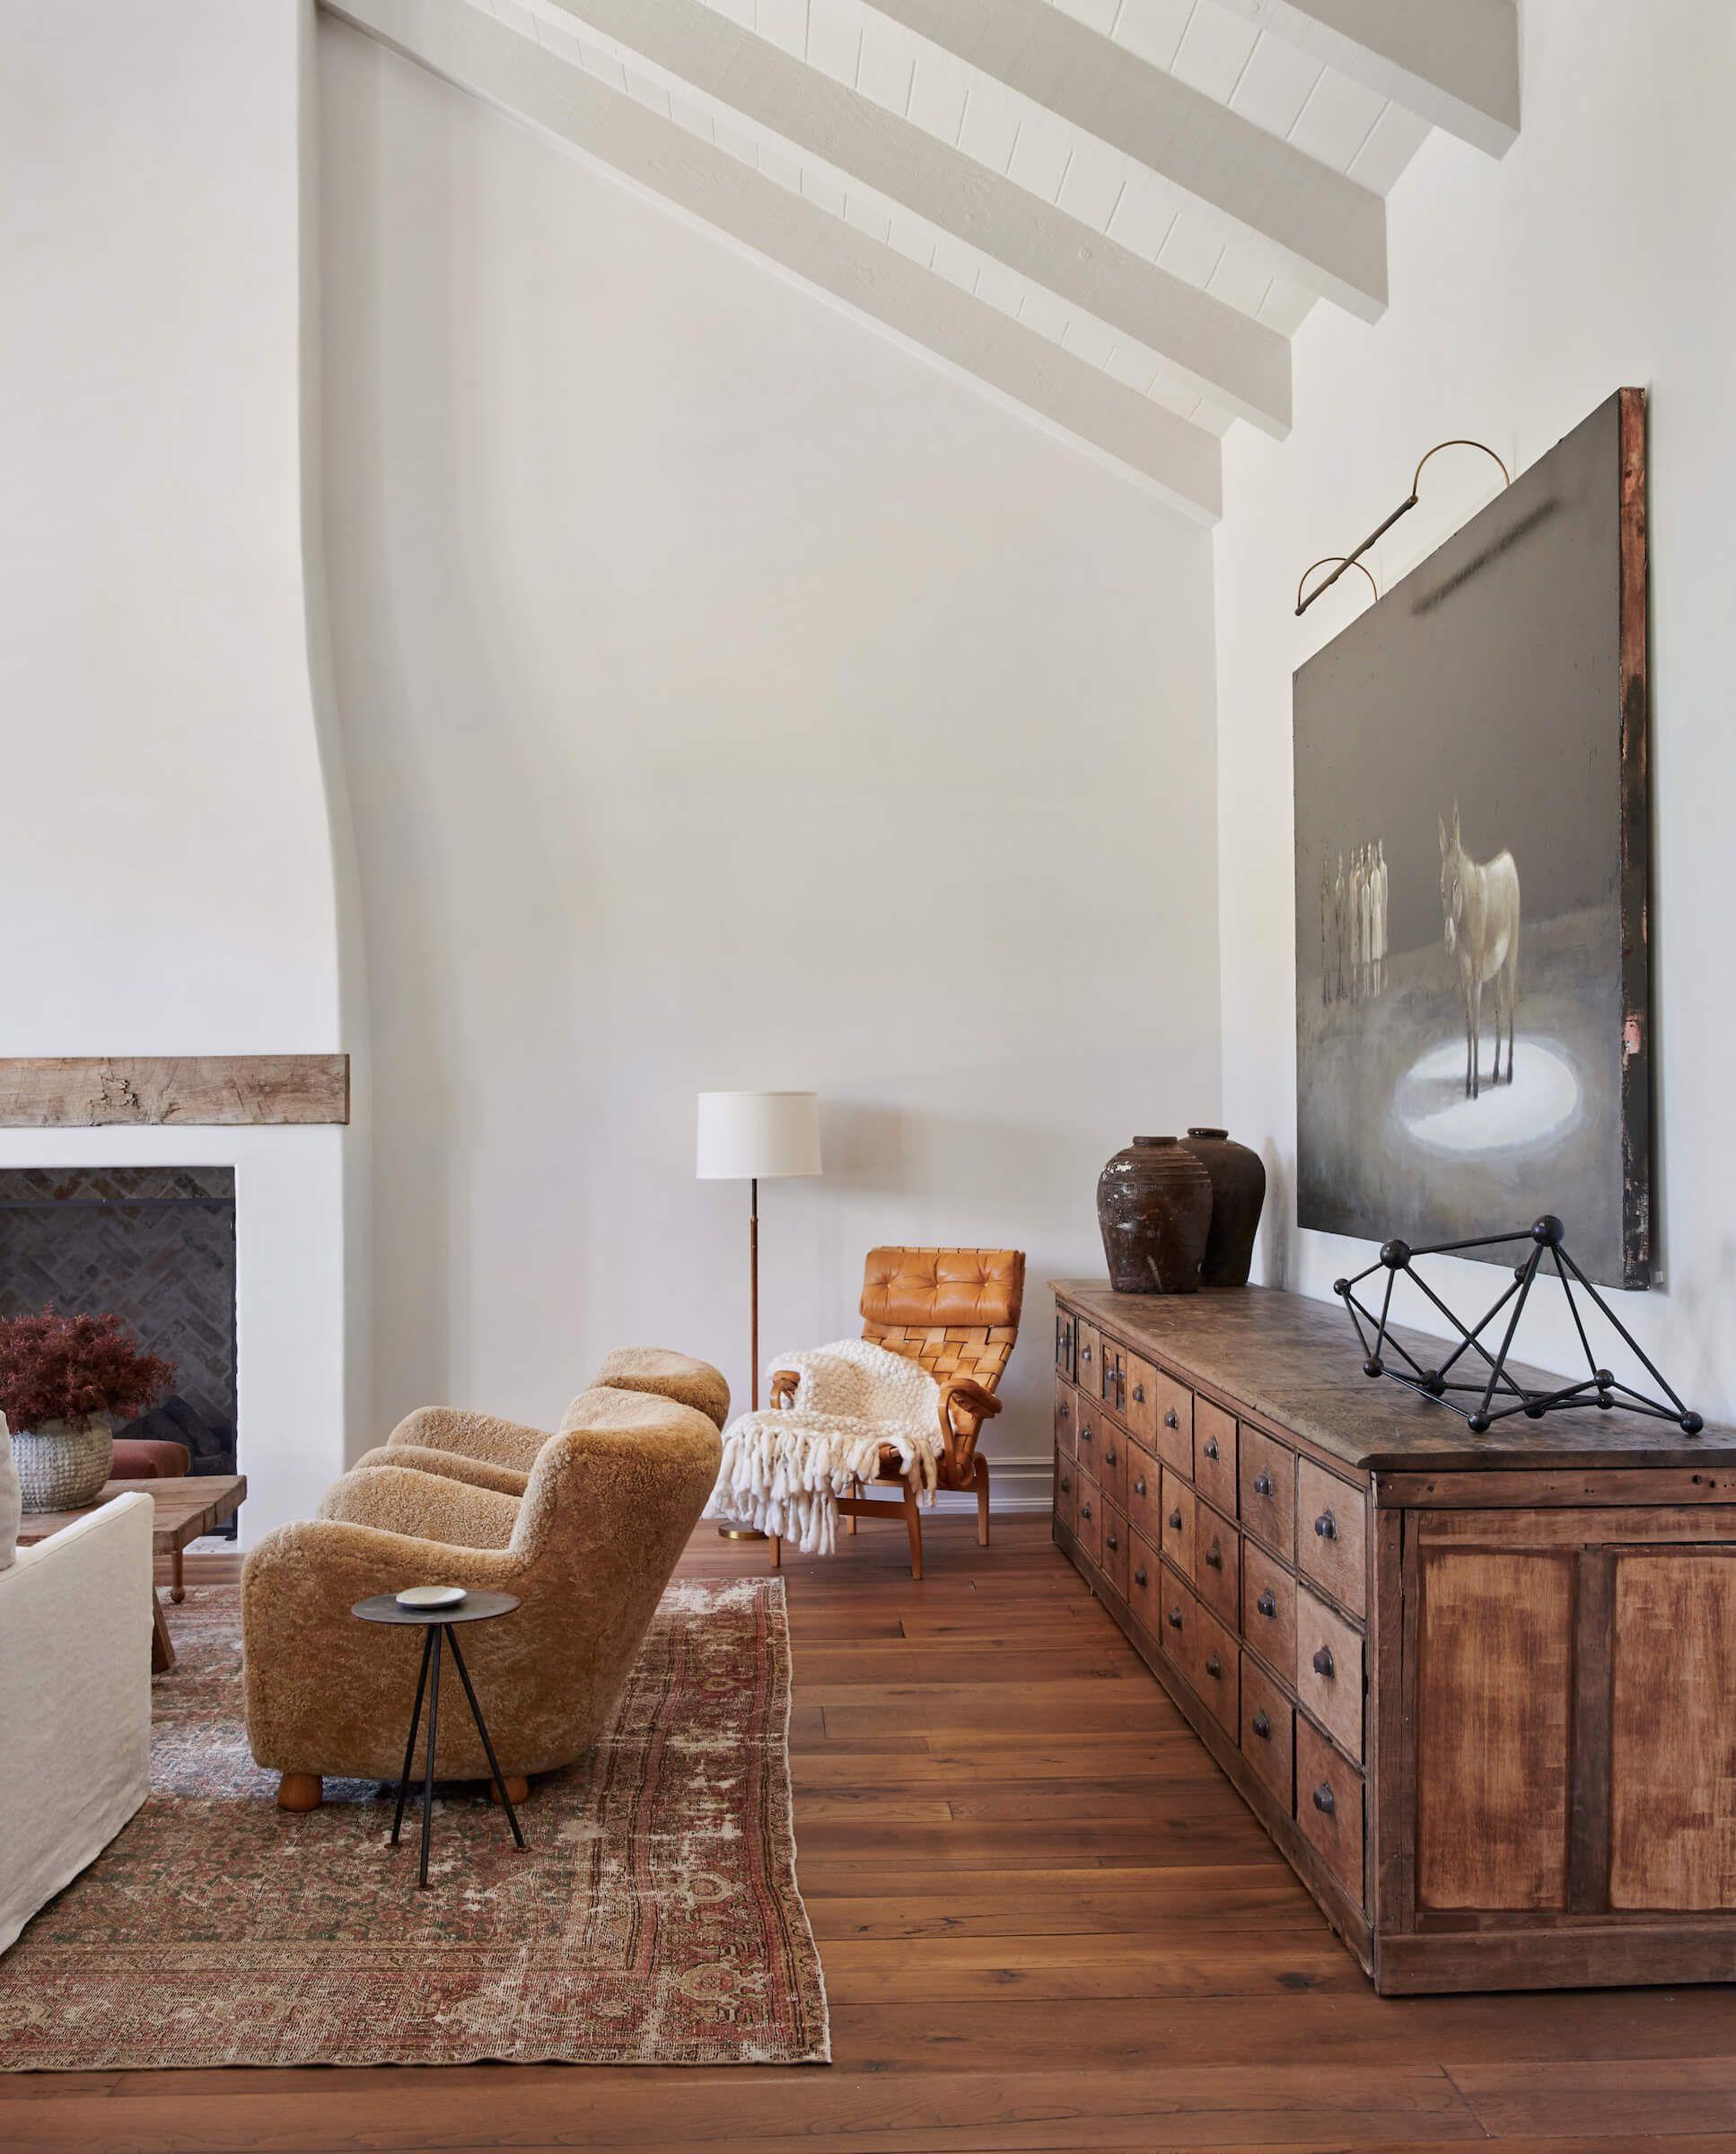 Amber-Interiors-Client-Bu-Round-Two-Tessa-Neustadt-59-1.jpg